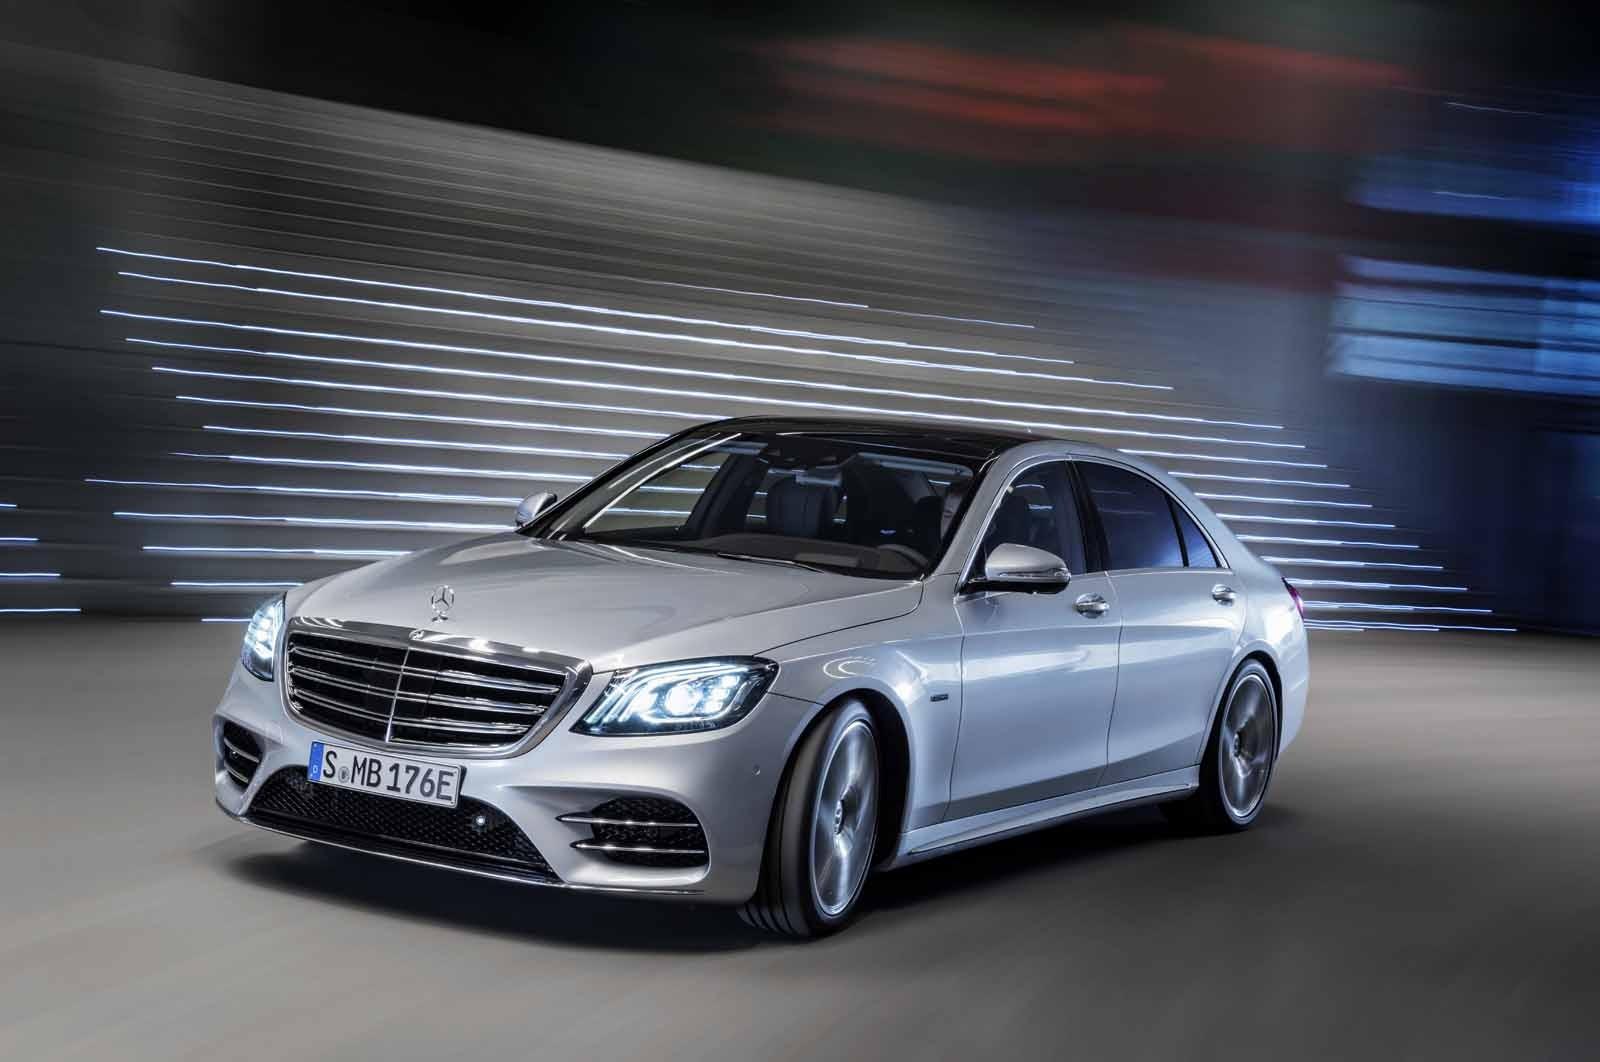 Benz S-Class научился тратить горючее наравне с Тойота Prius